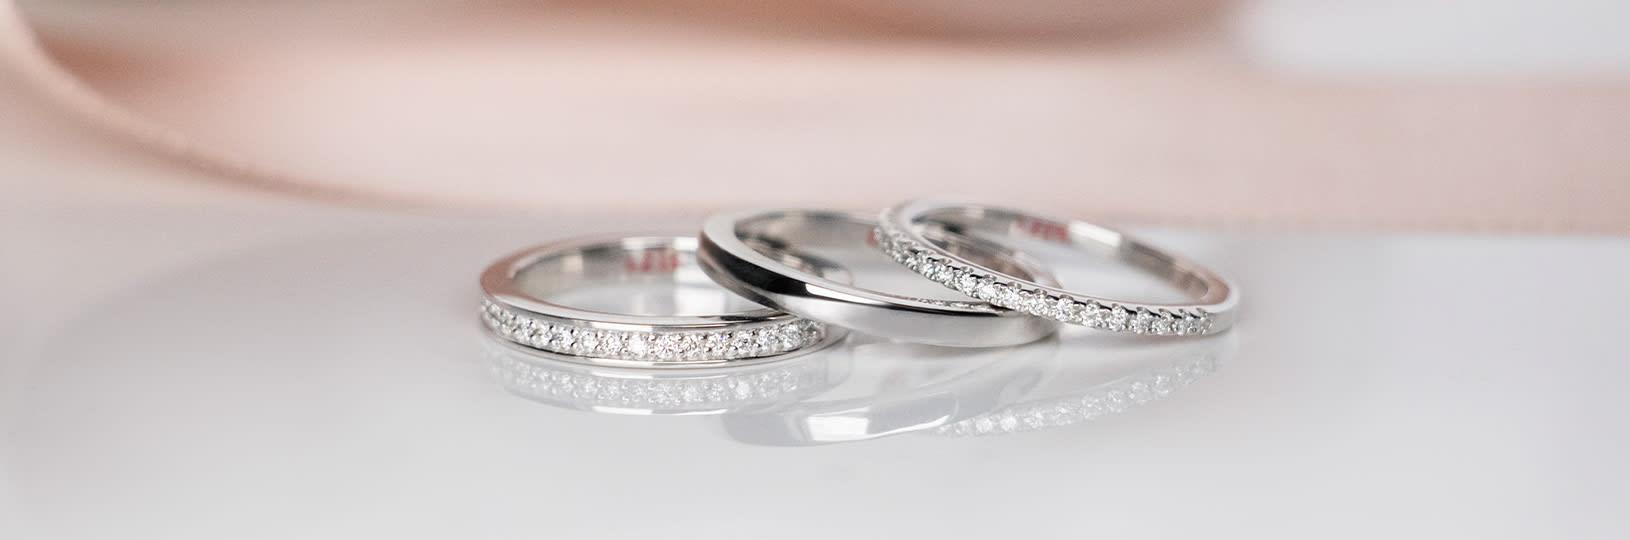 Three wedding bands